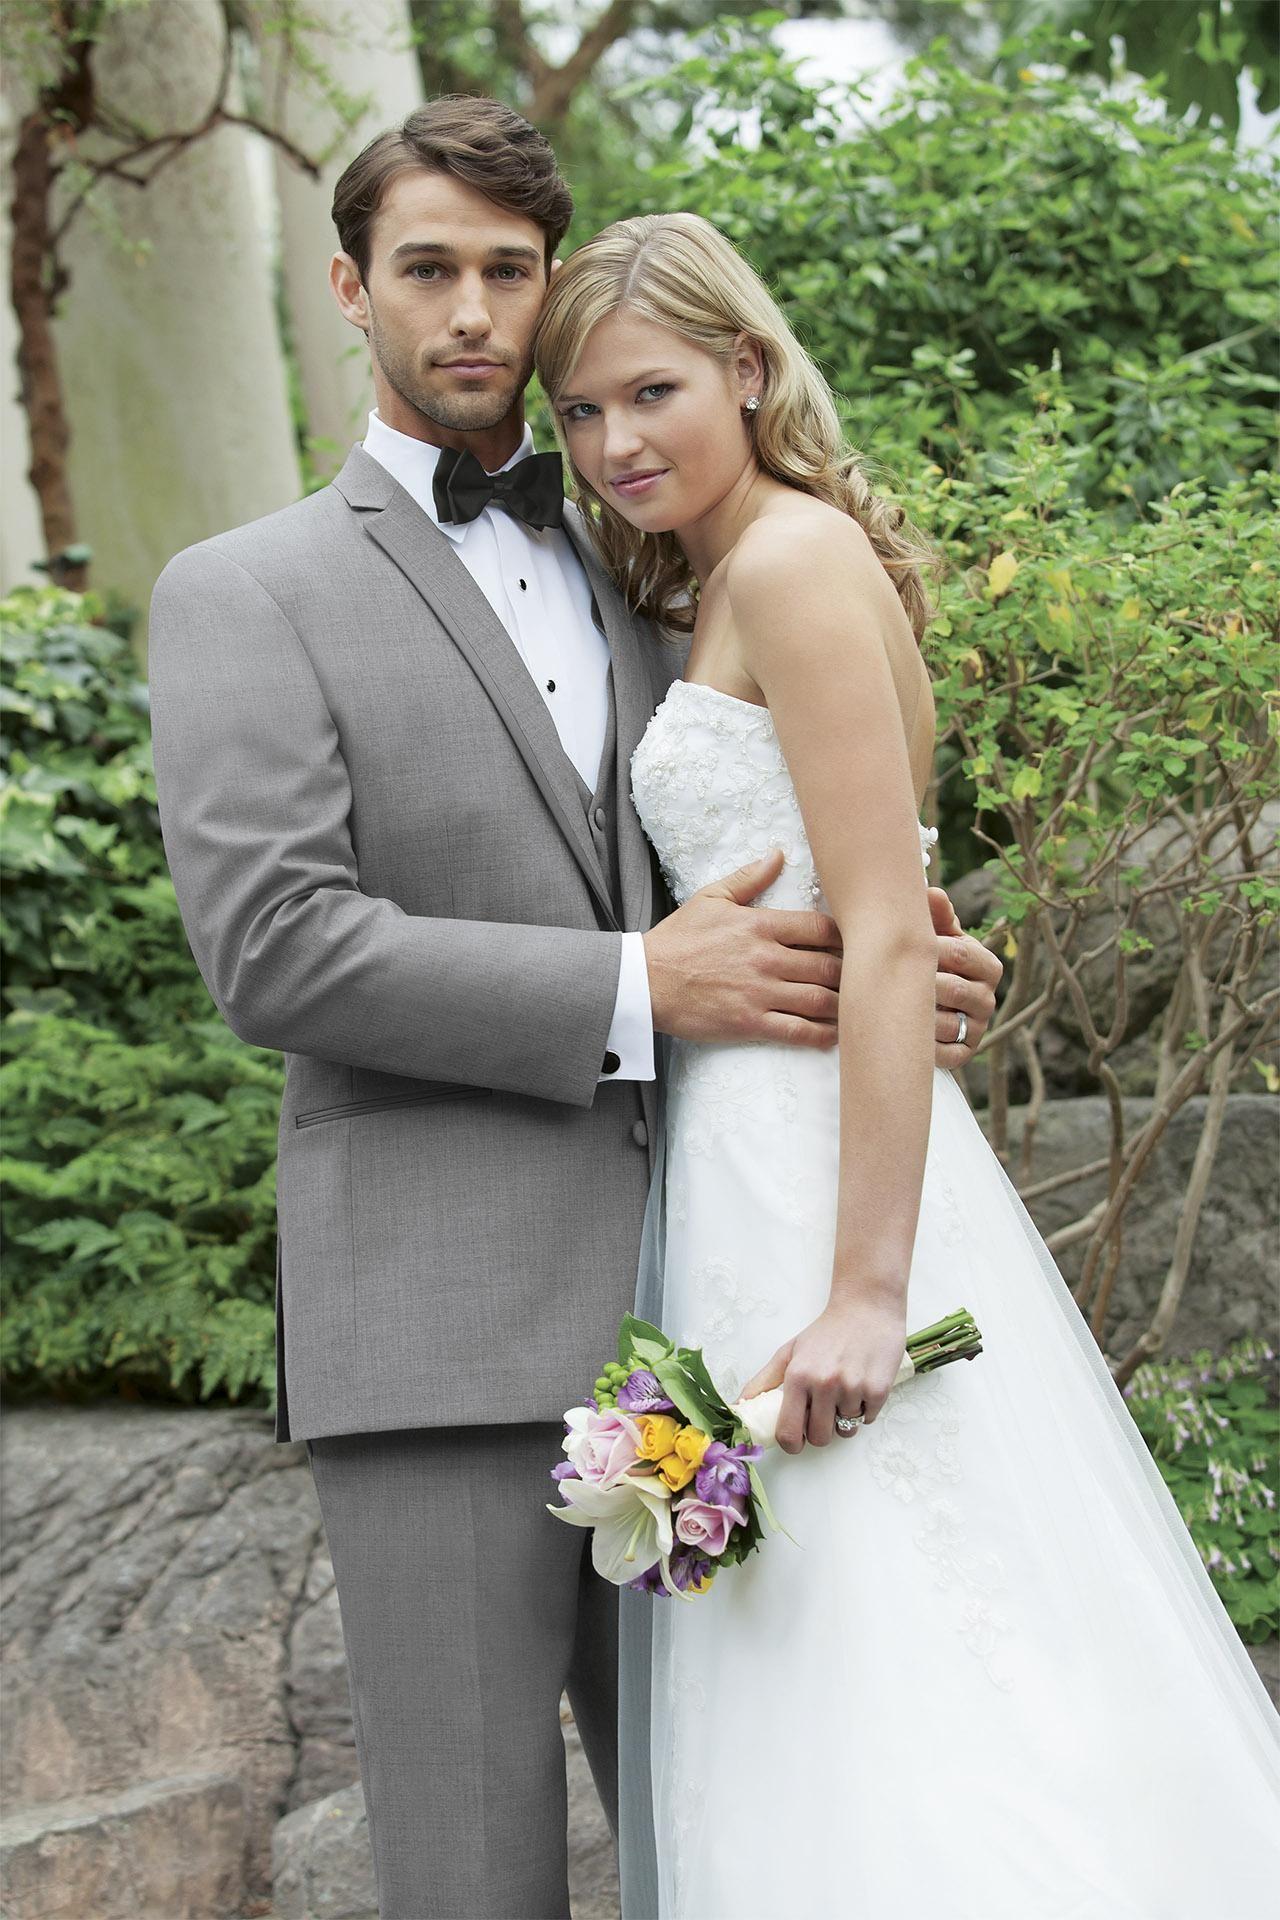 Suit & Tuxedo Rentals Available at Ella Park Bridal | Newburgh, IN ...